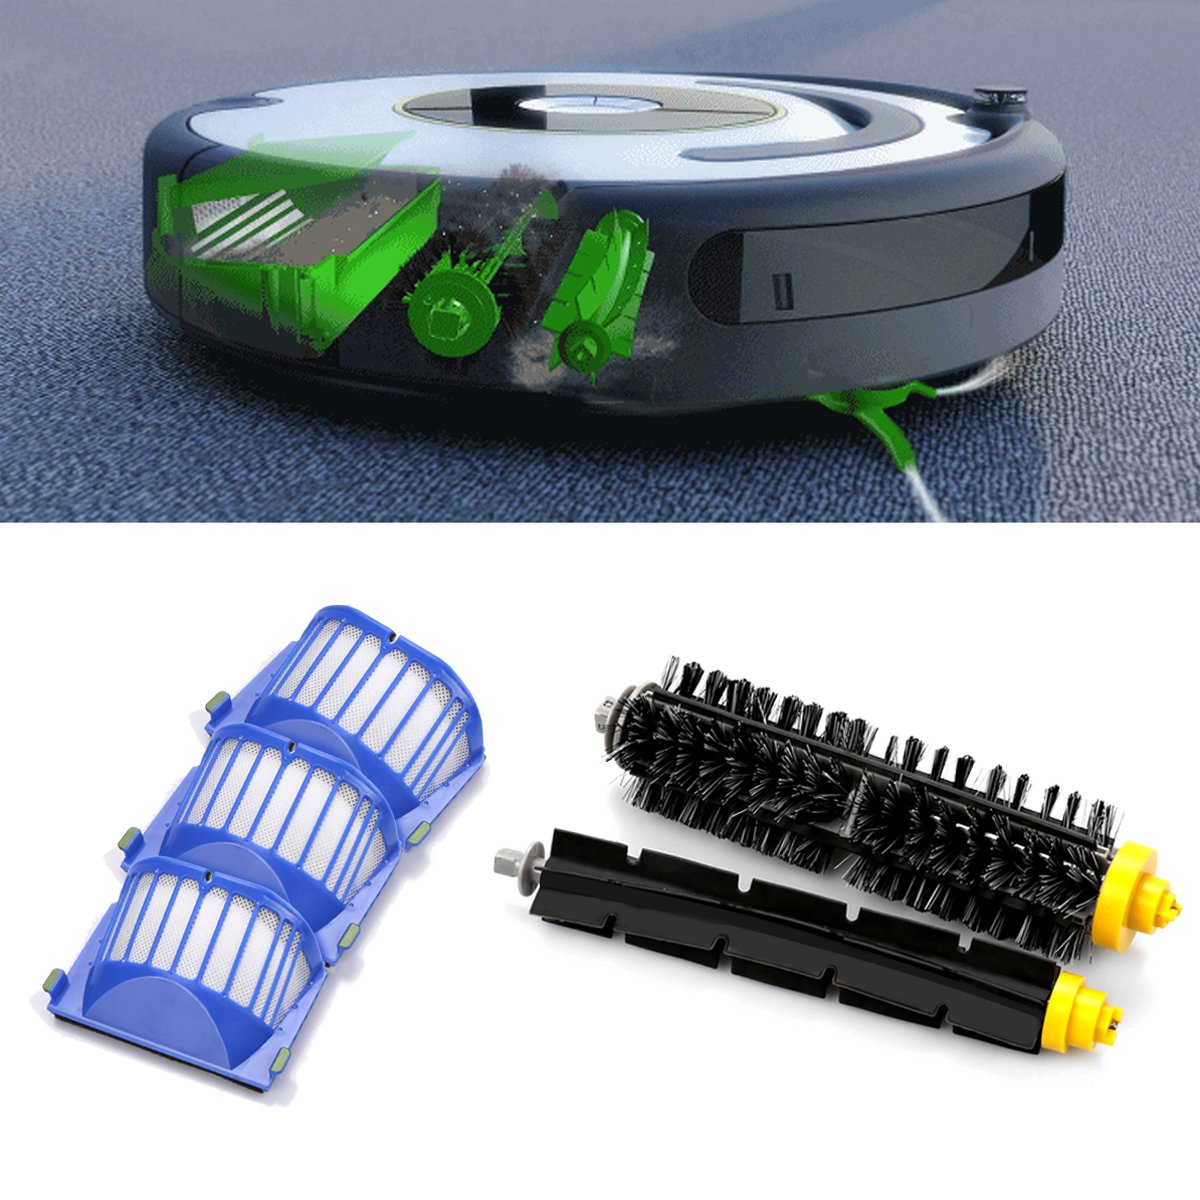 ENERGUP Repuesto de cepillos para IRobot Roomba 600 605 Series 610 ...